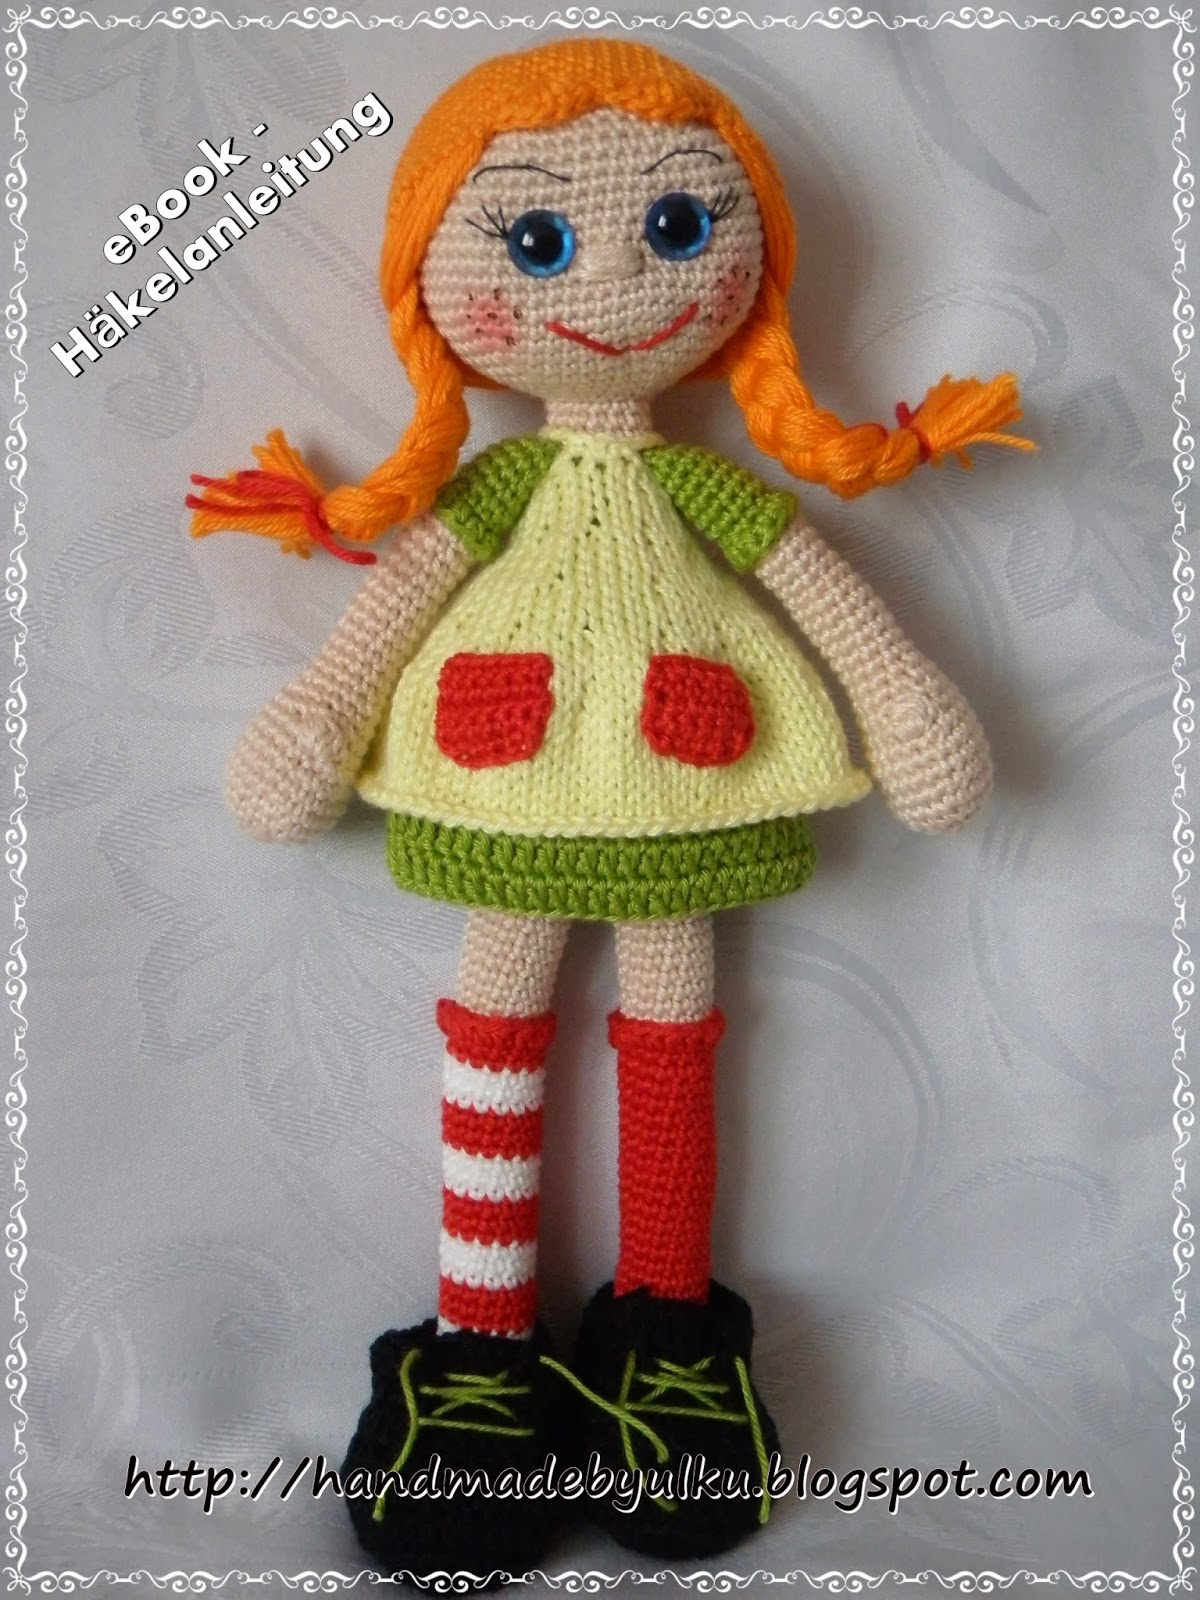 Amigurumi Pippi Yapilisi : Handmade by ulku: Amigurumi Hakelanleitung Pippi / Pattern ...